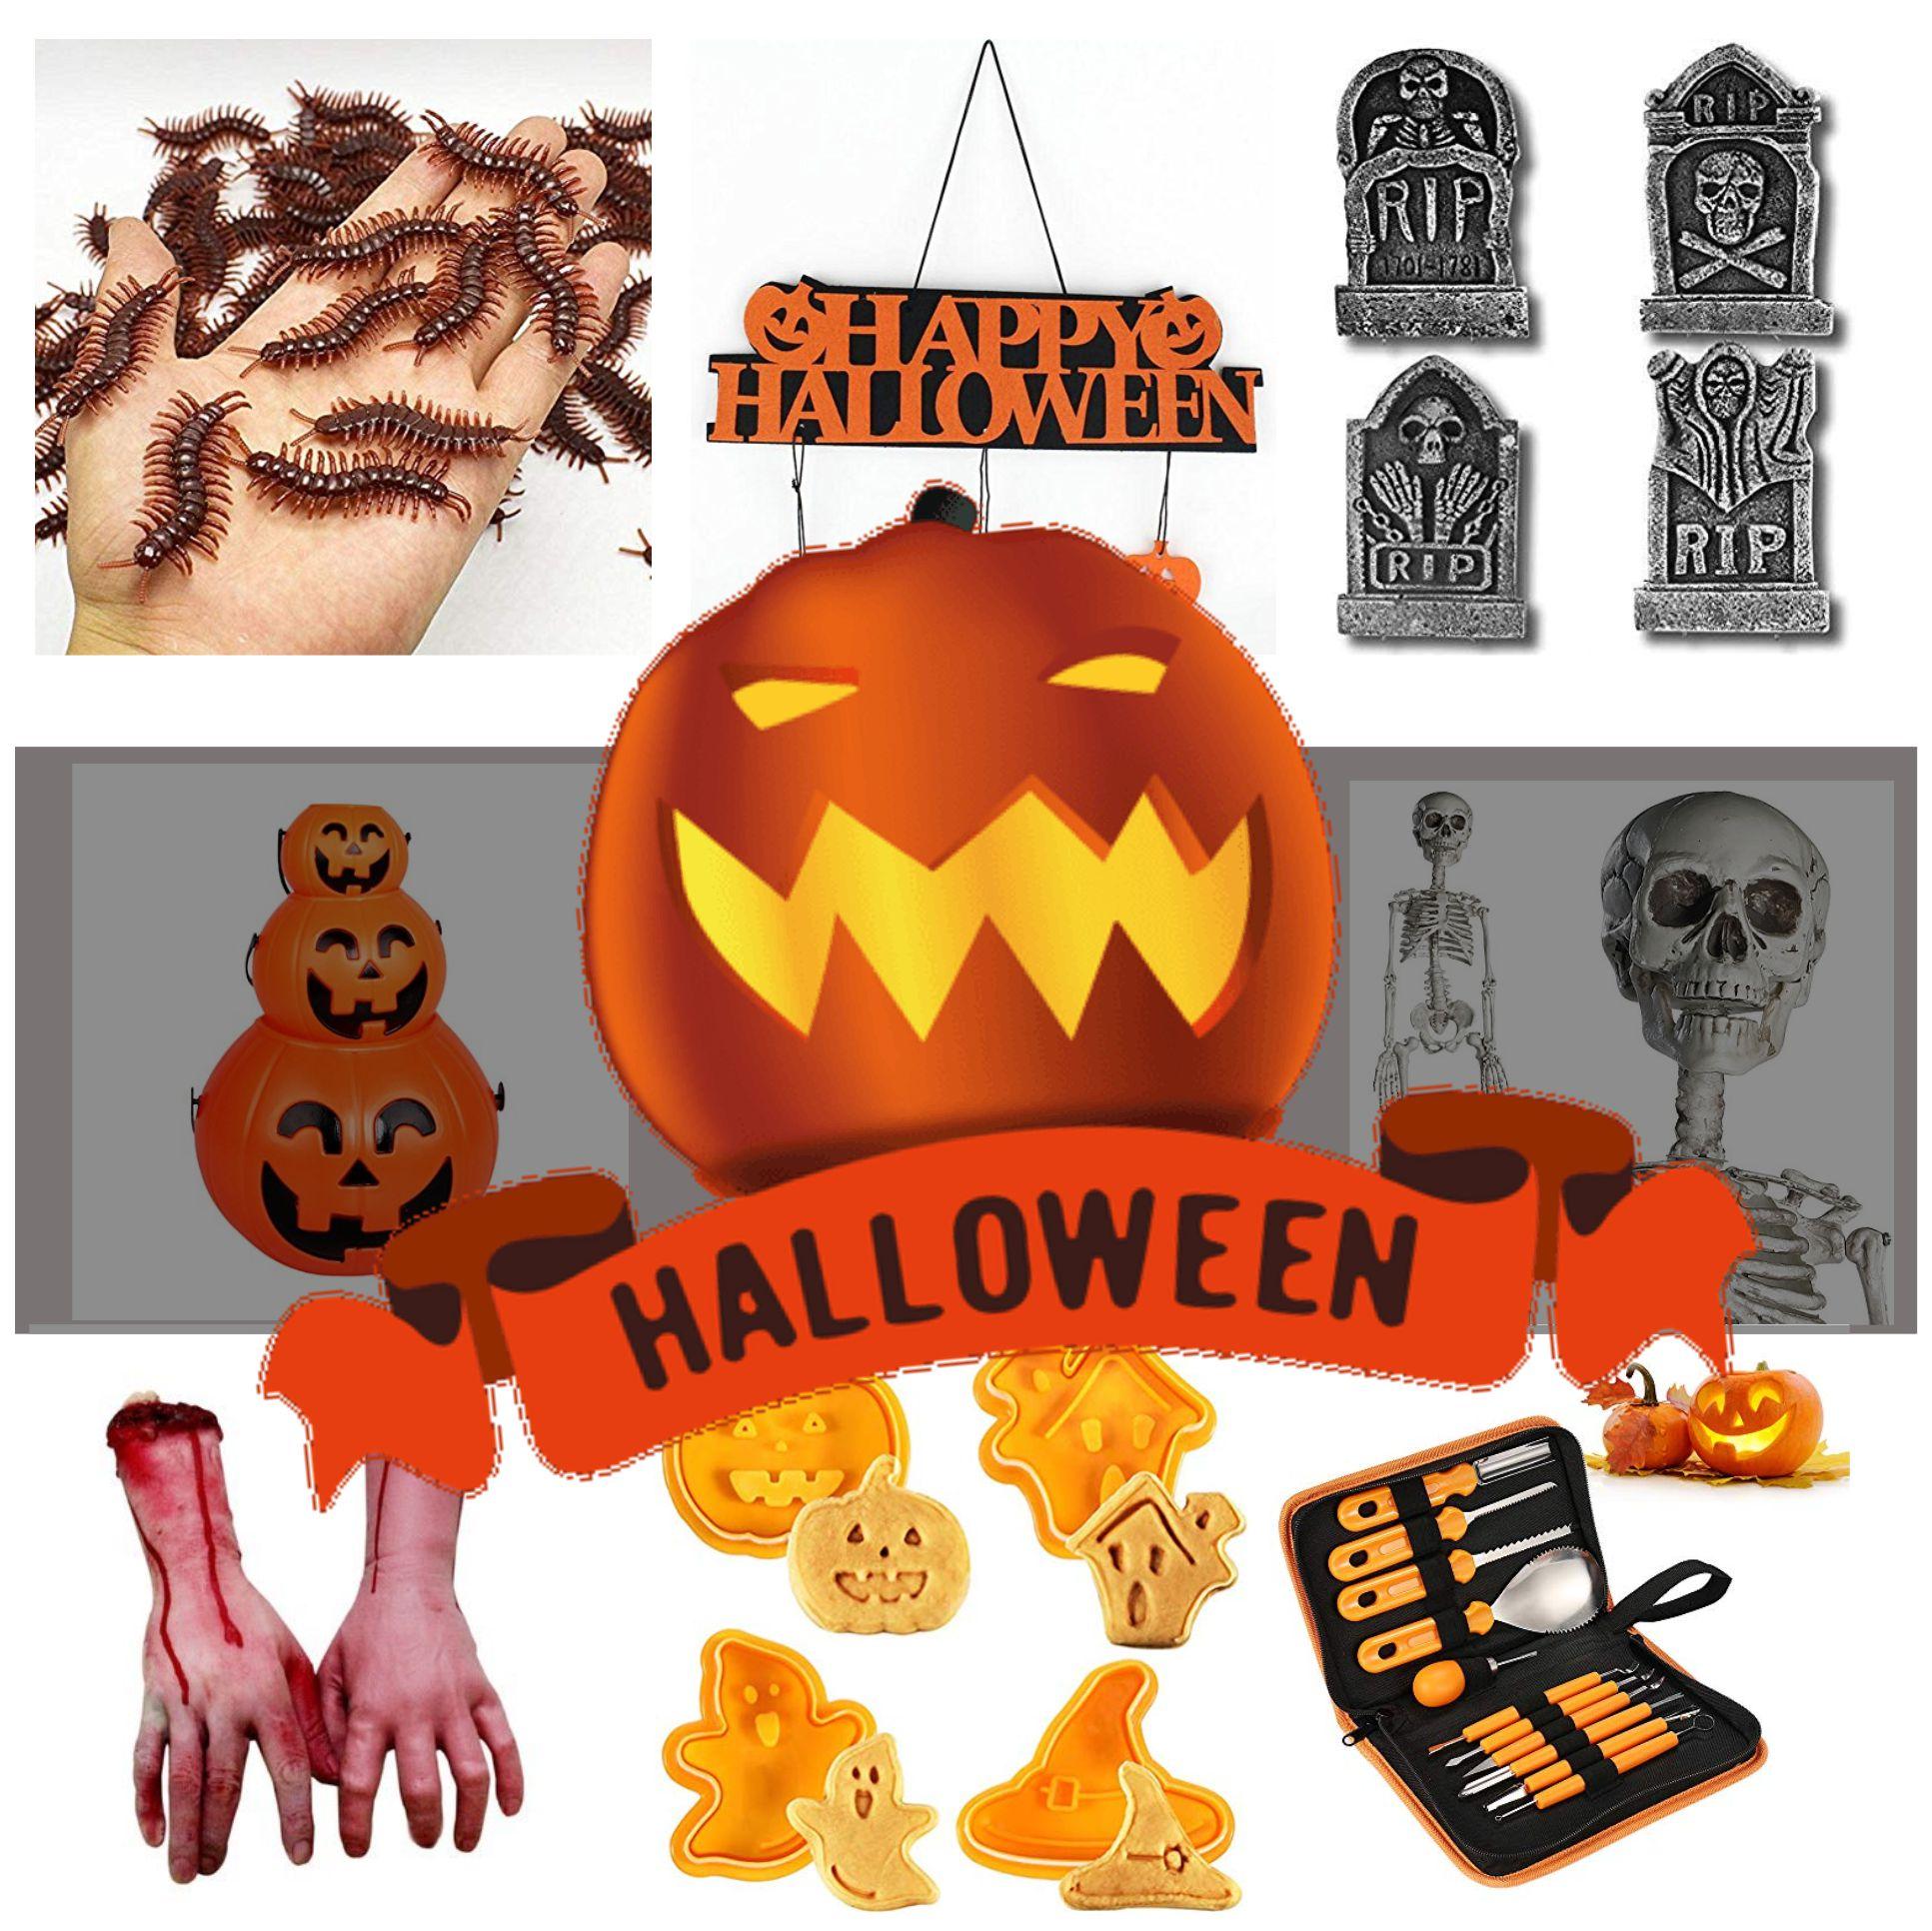 Novedades de decoración terror para Halloween 2021